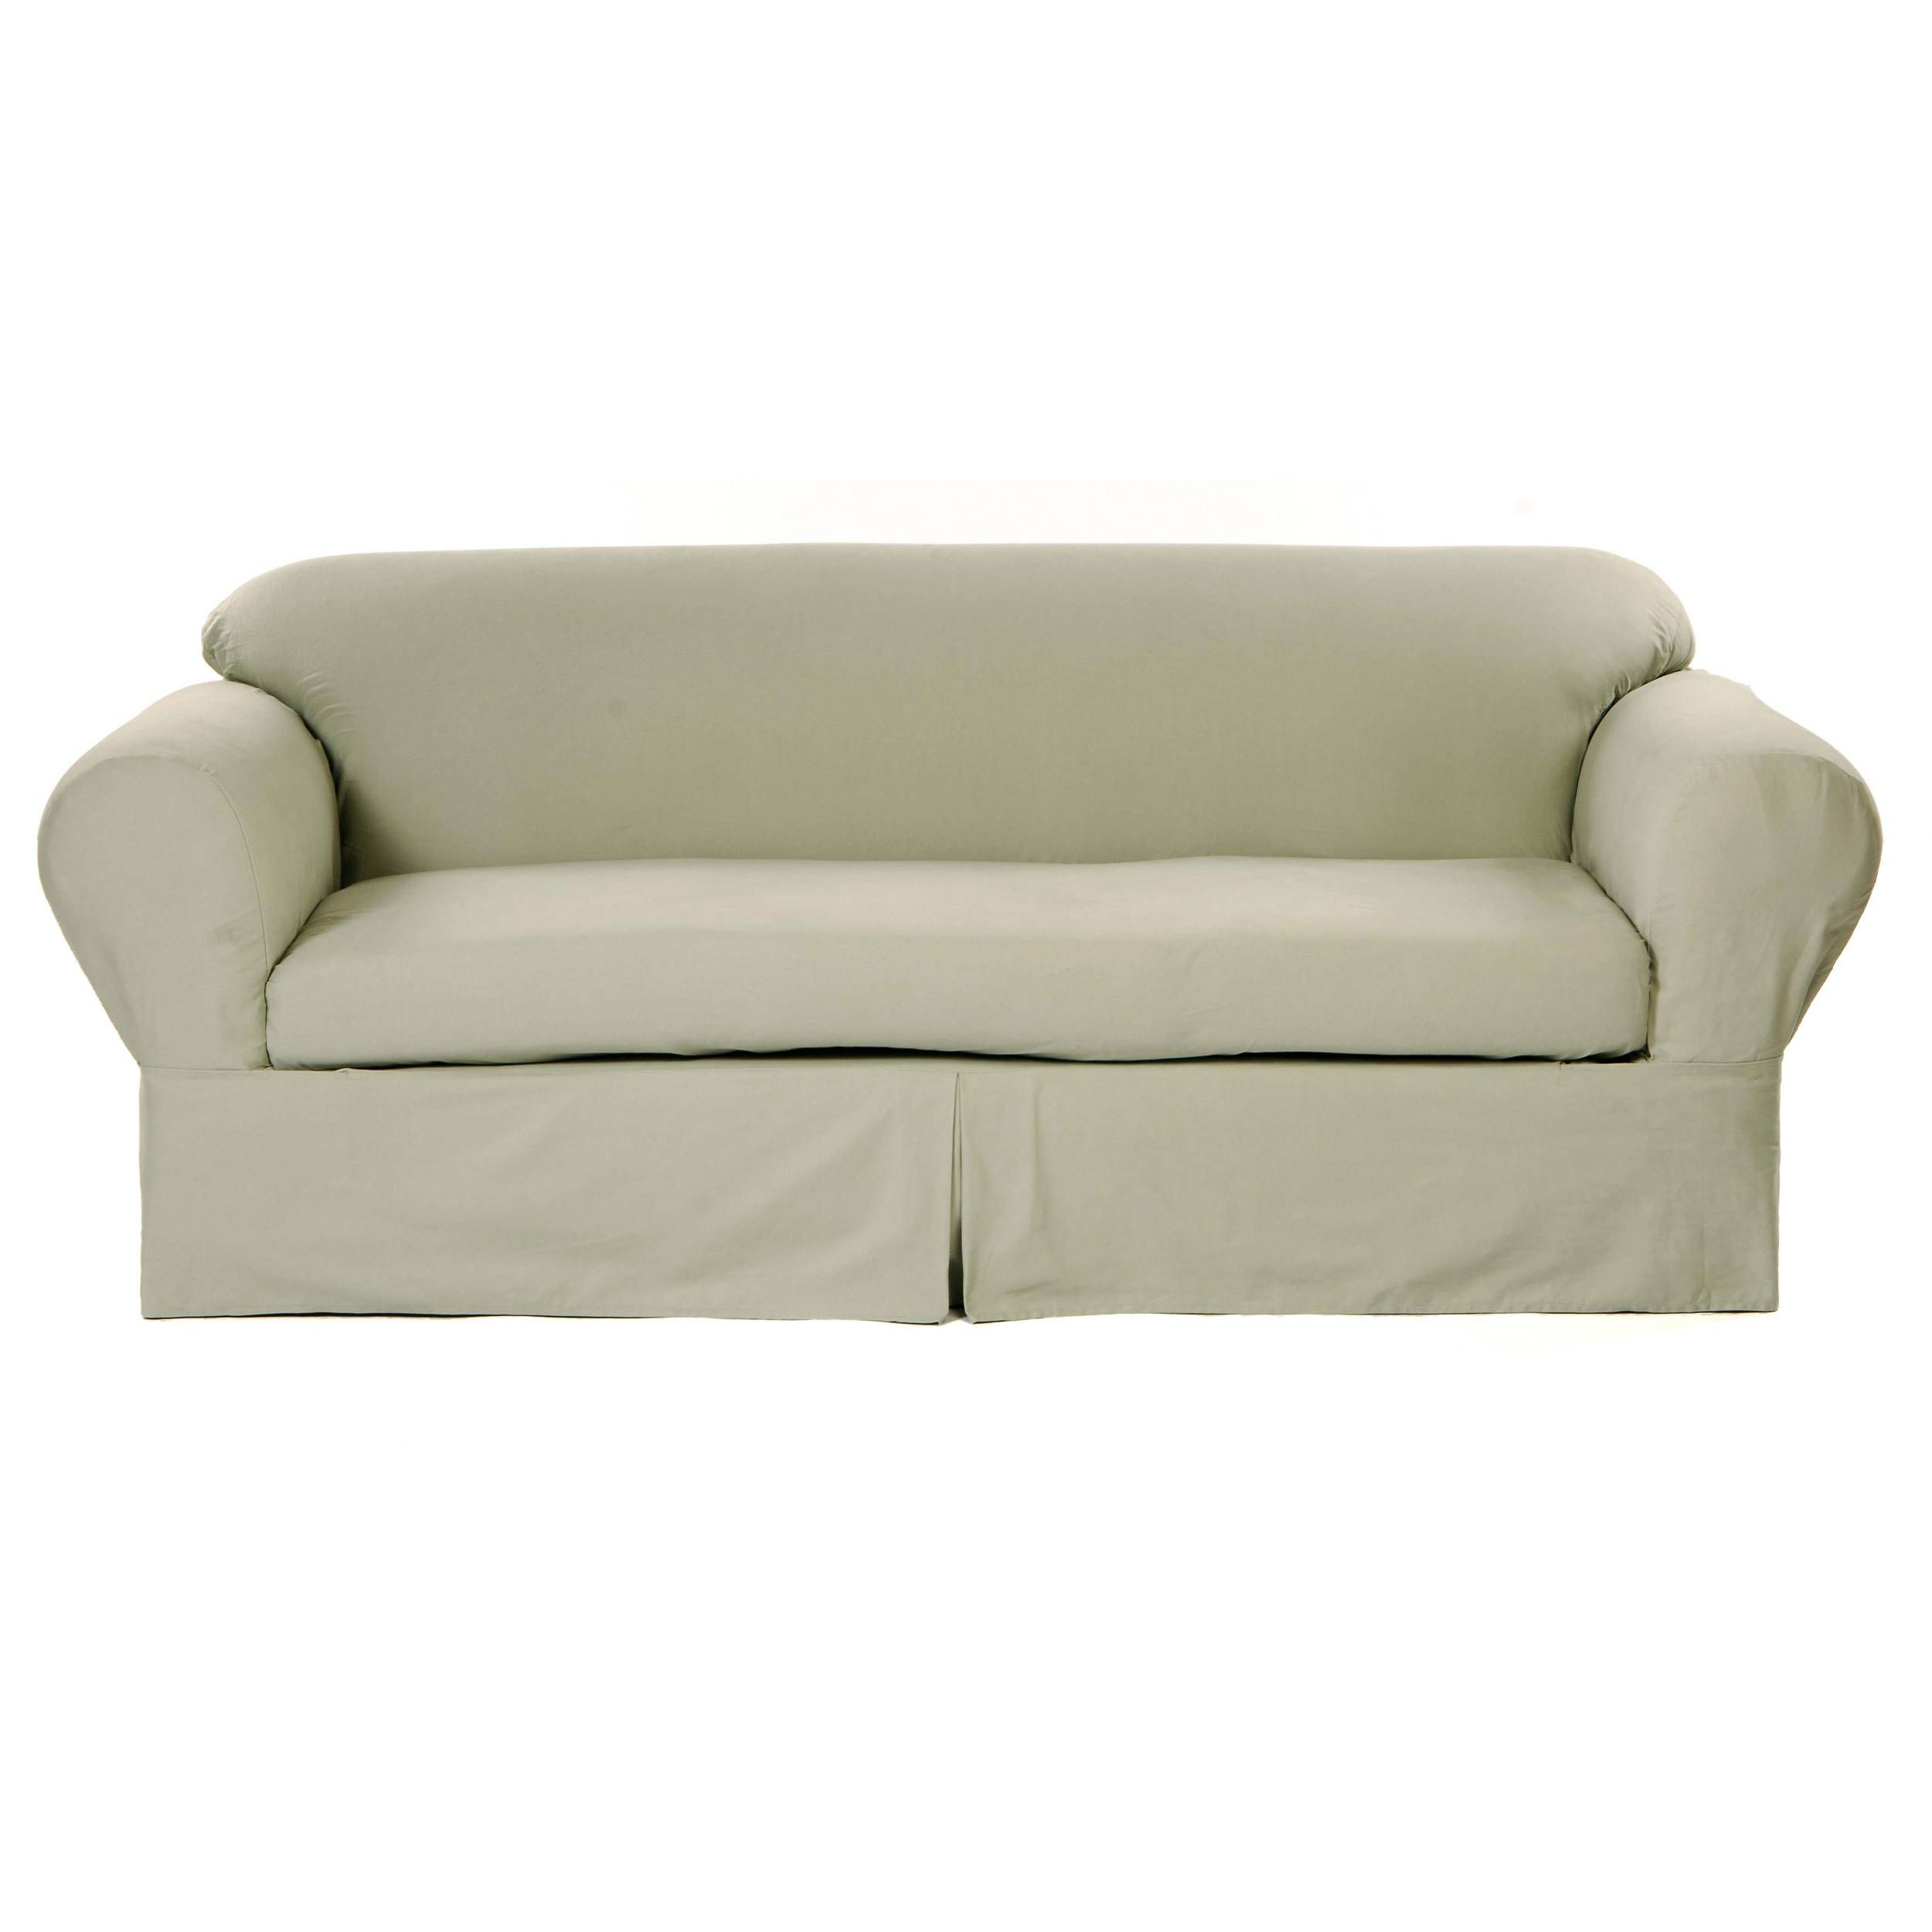 Ideas: 3 Cushion Sofa Slipcover Pottery Barn | Pottery Barn in Sofa Rocking Chairs (Image 11 of 30)